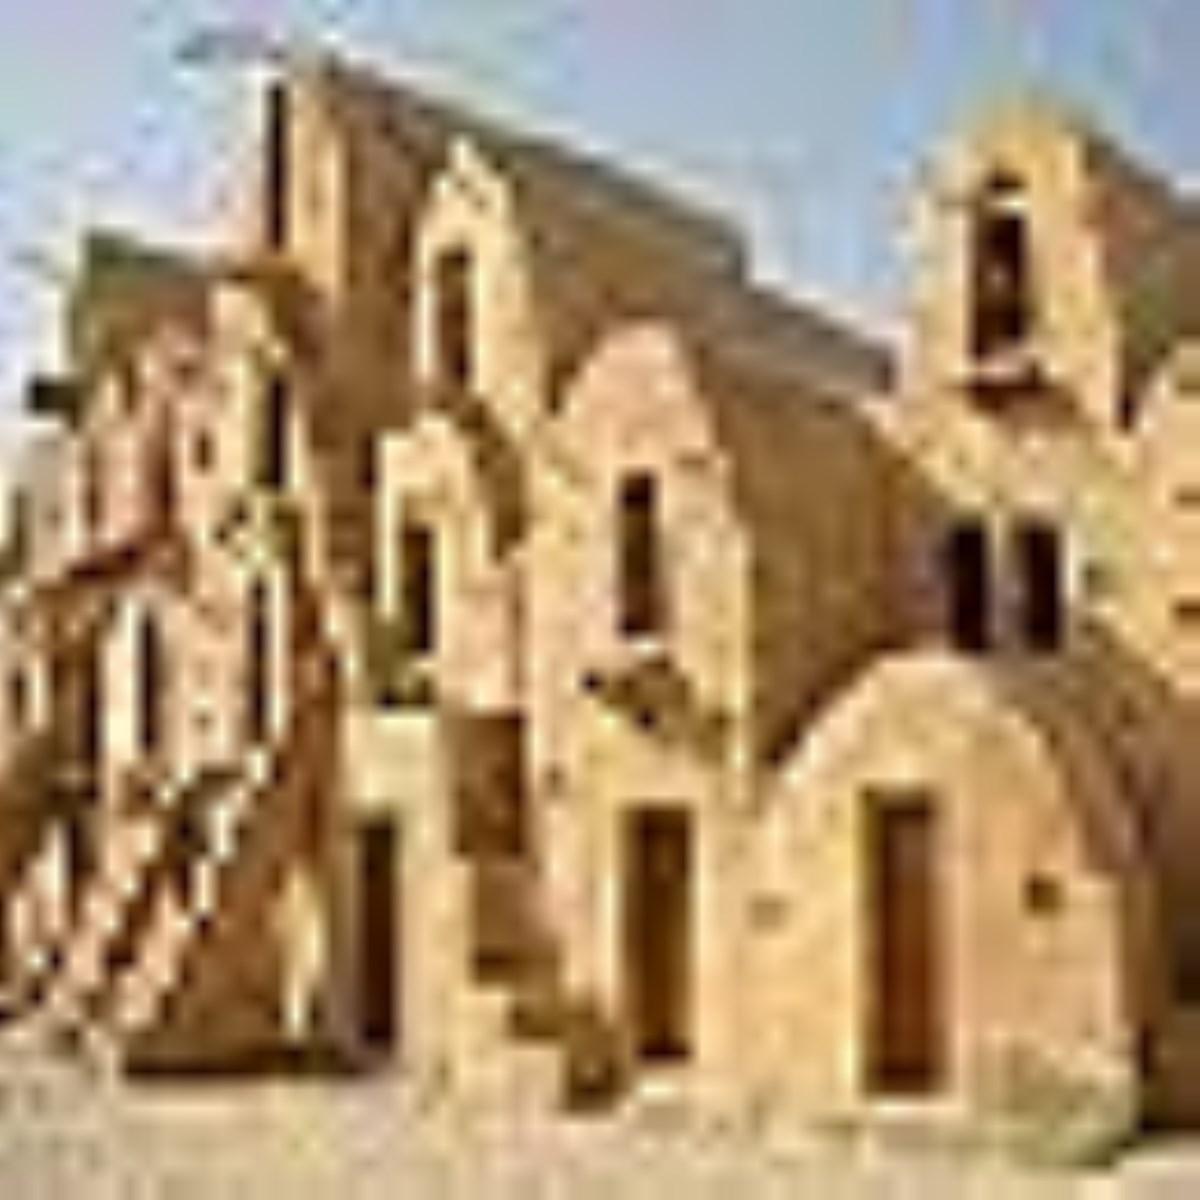 معماری ، هنر دیرین انسان